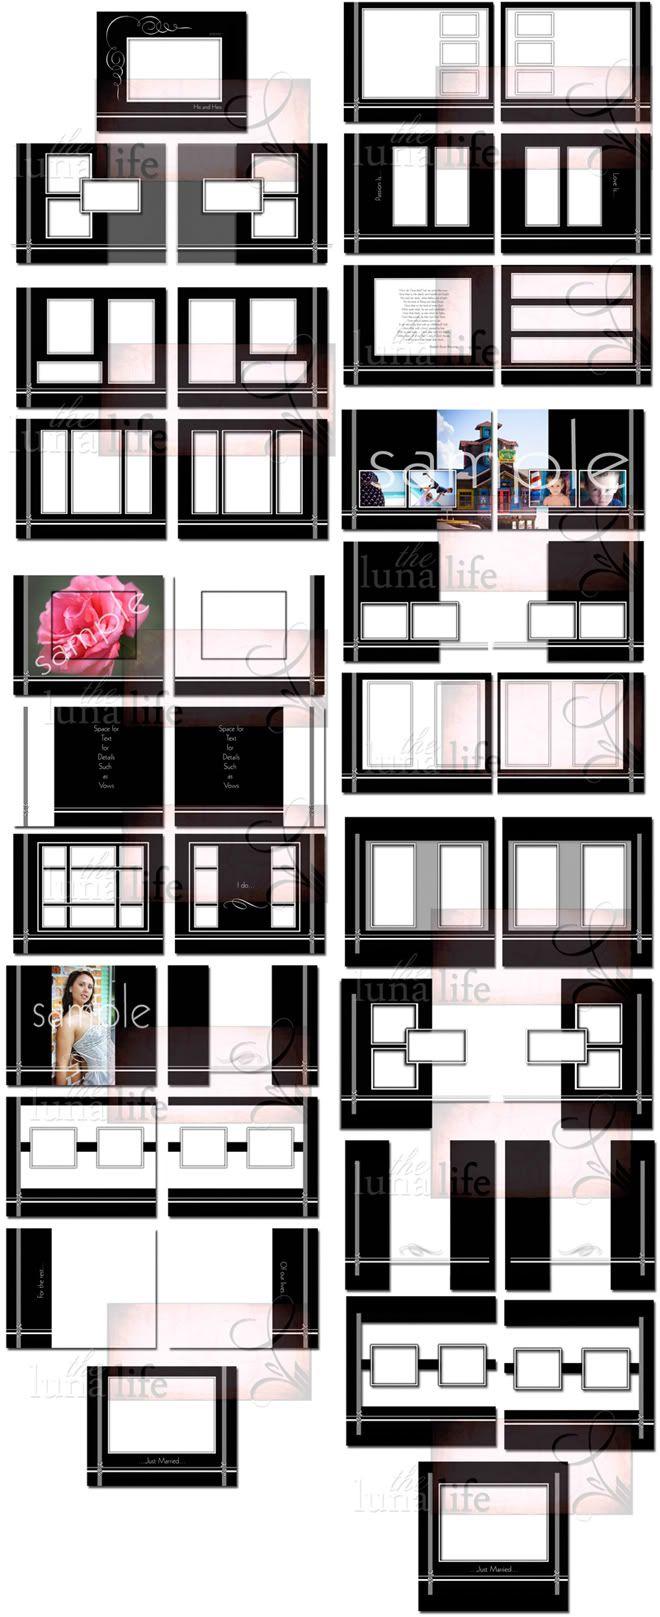 wedding album page layout - Google Search | LIFE | Pinterest ...